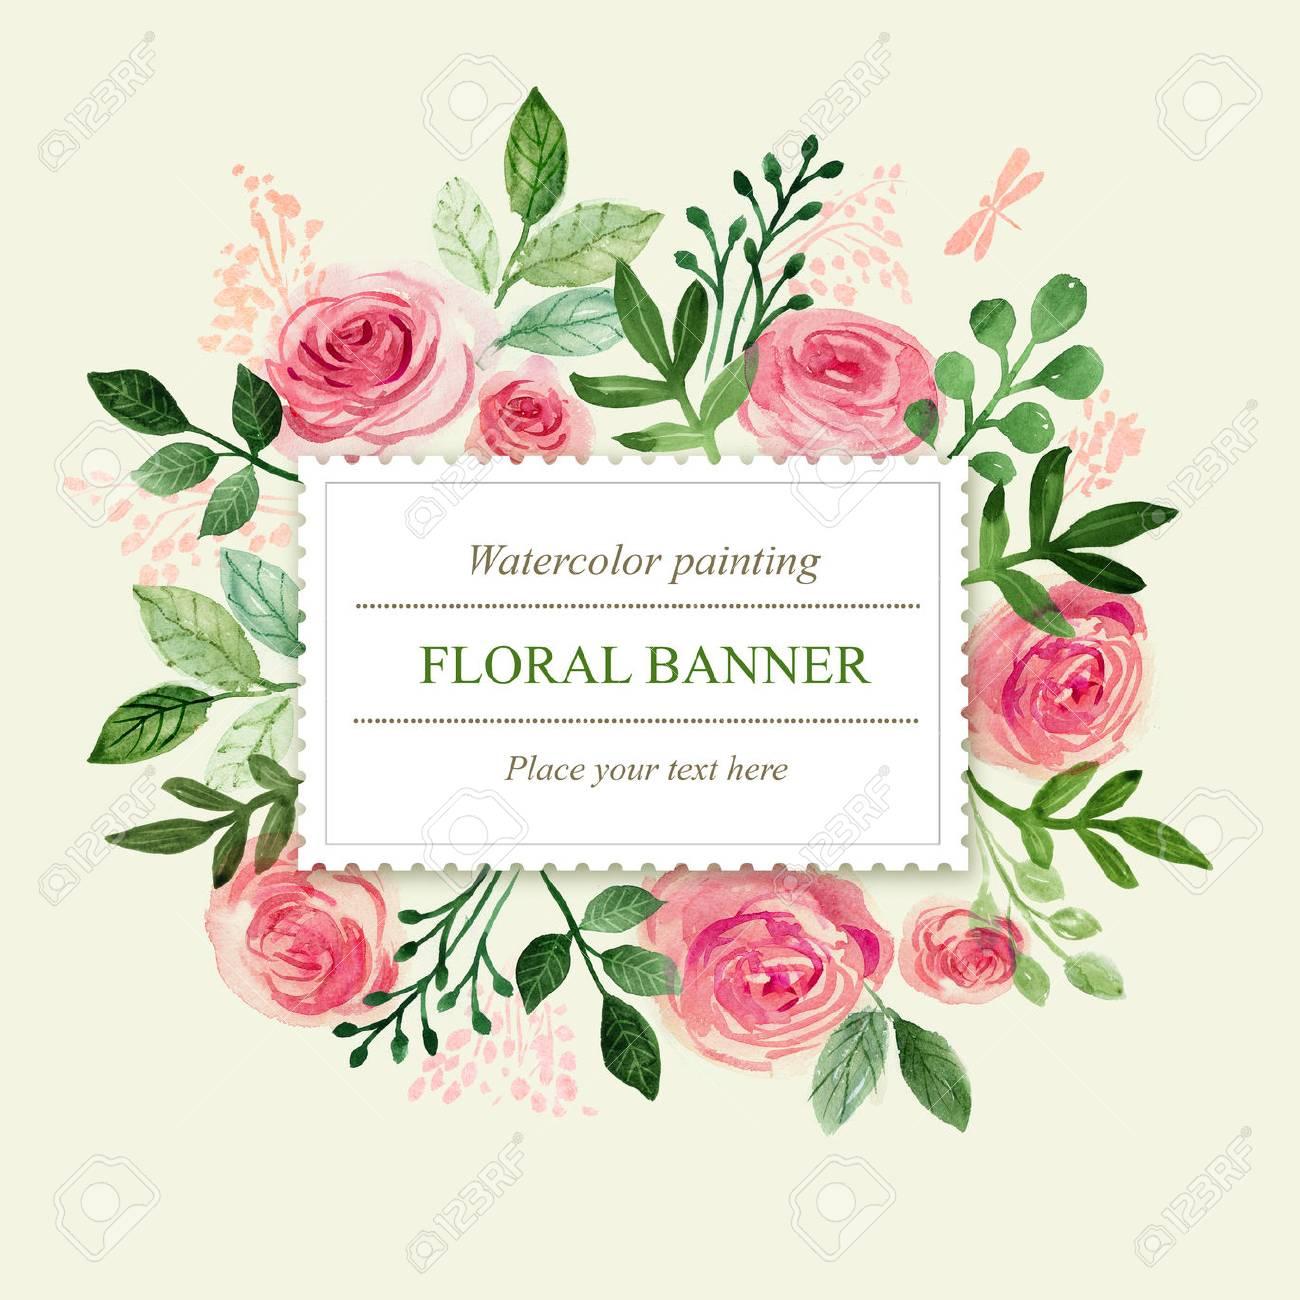 Watercolor floral greeting card. Flowers roses. Handmade. Vintage background - 65587971